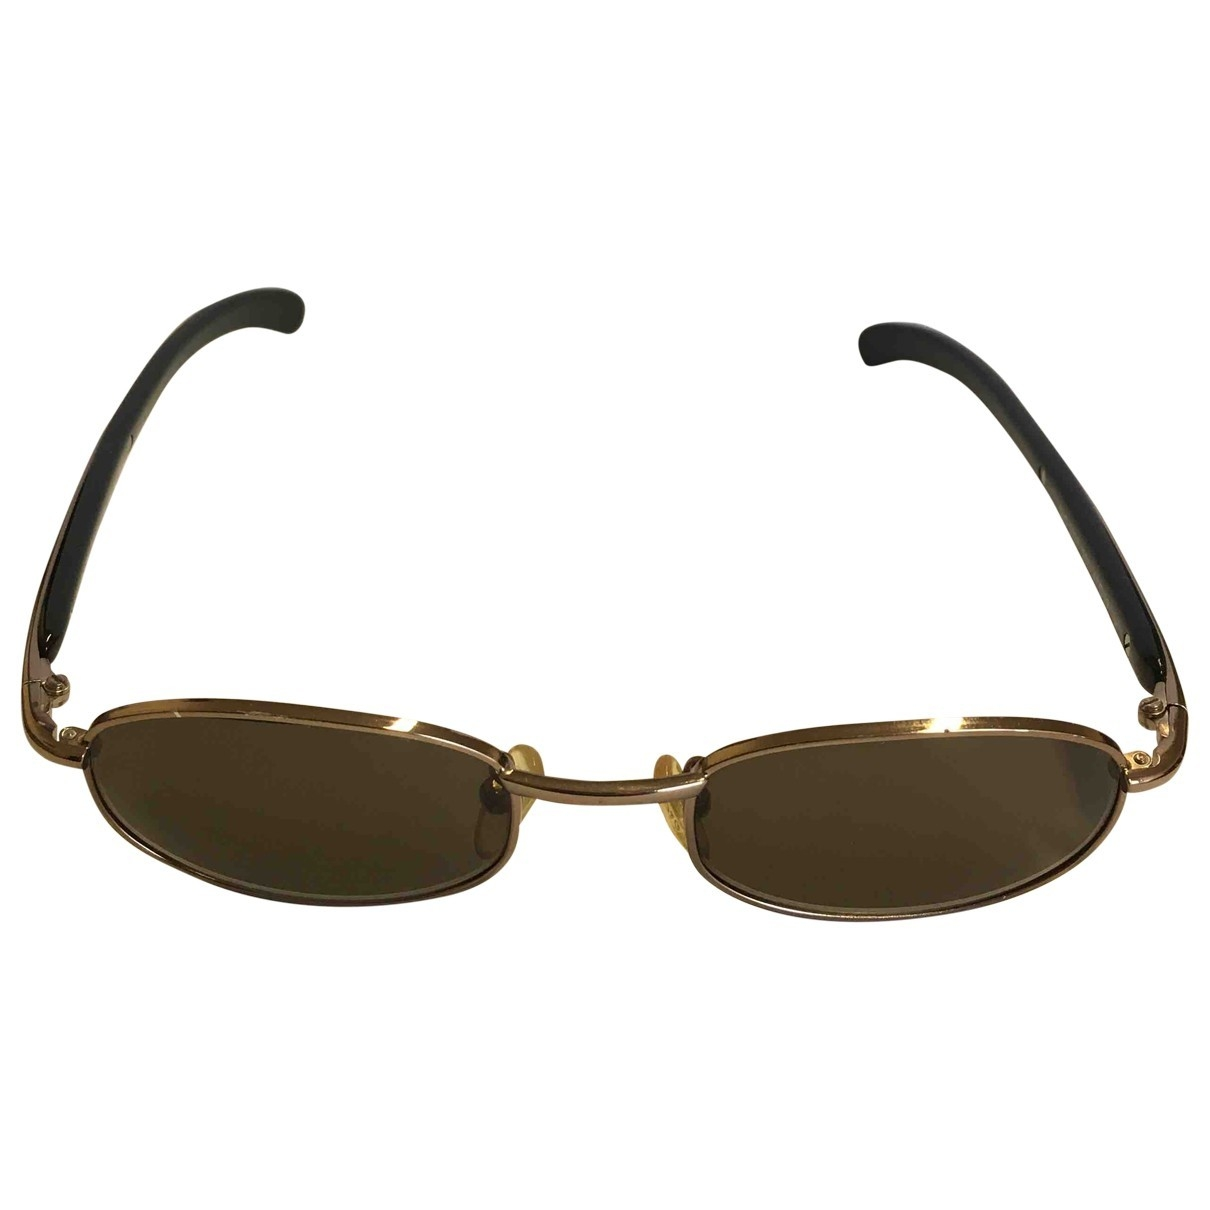 D&g \N Metallic Metal Sunglasses for Women \N